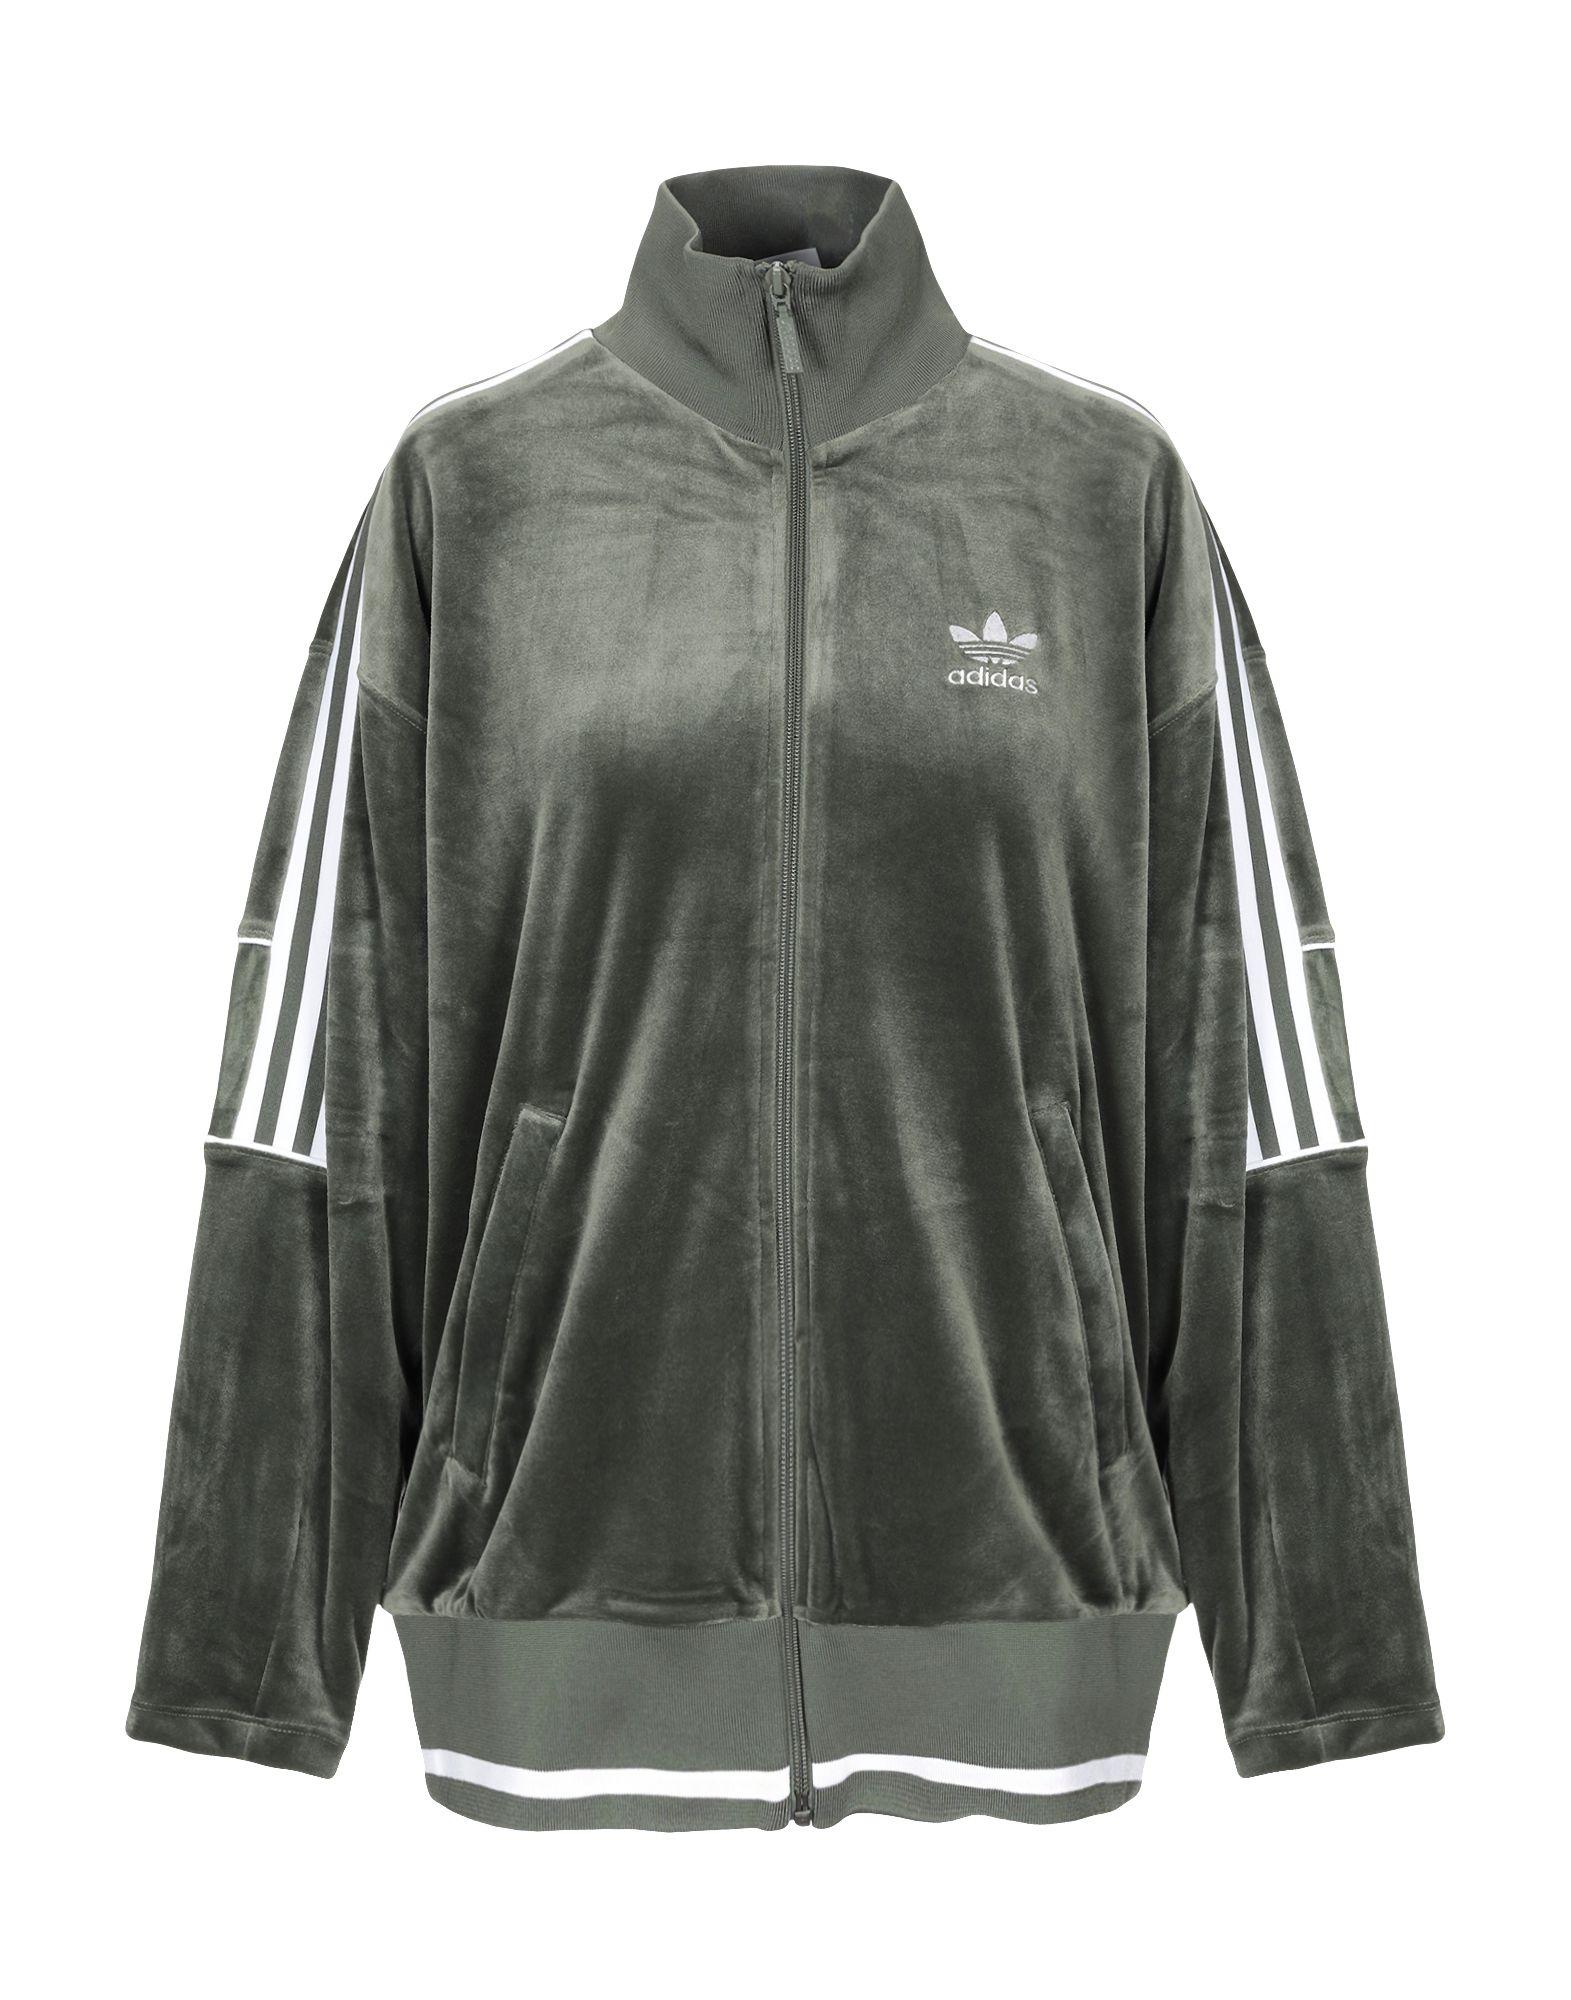 Felpa Adidas Originals donna donna - 12302361LR